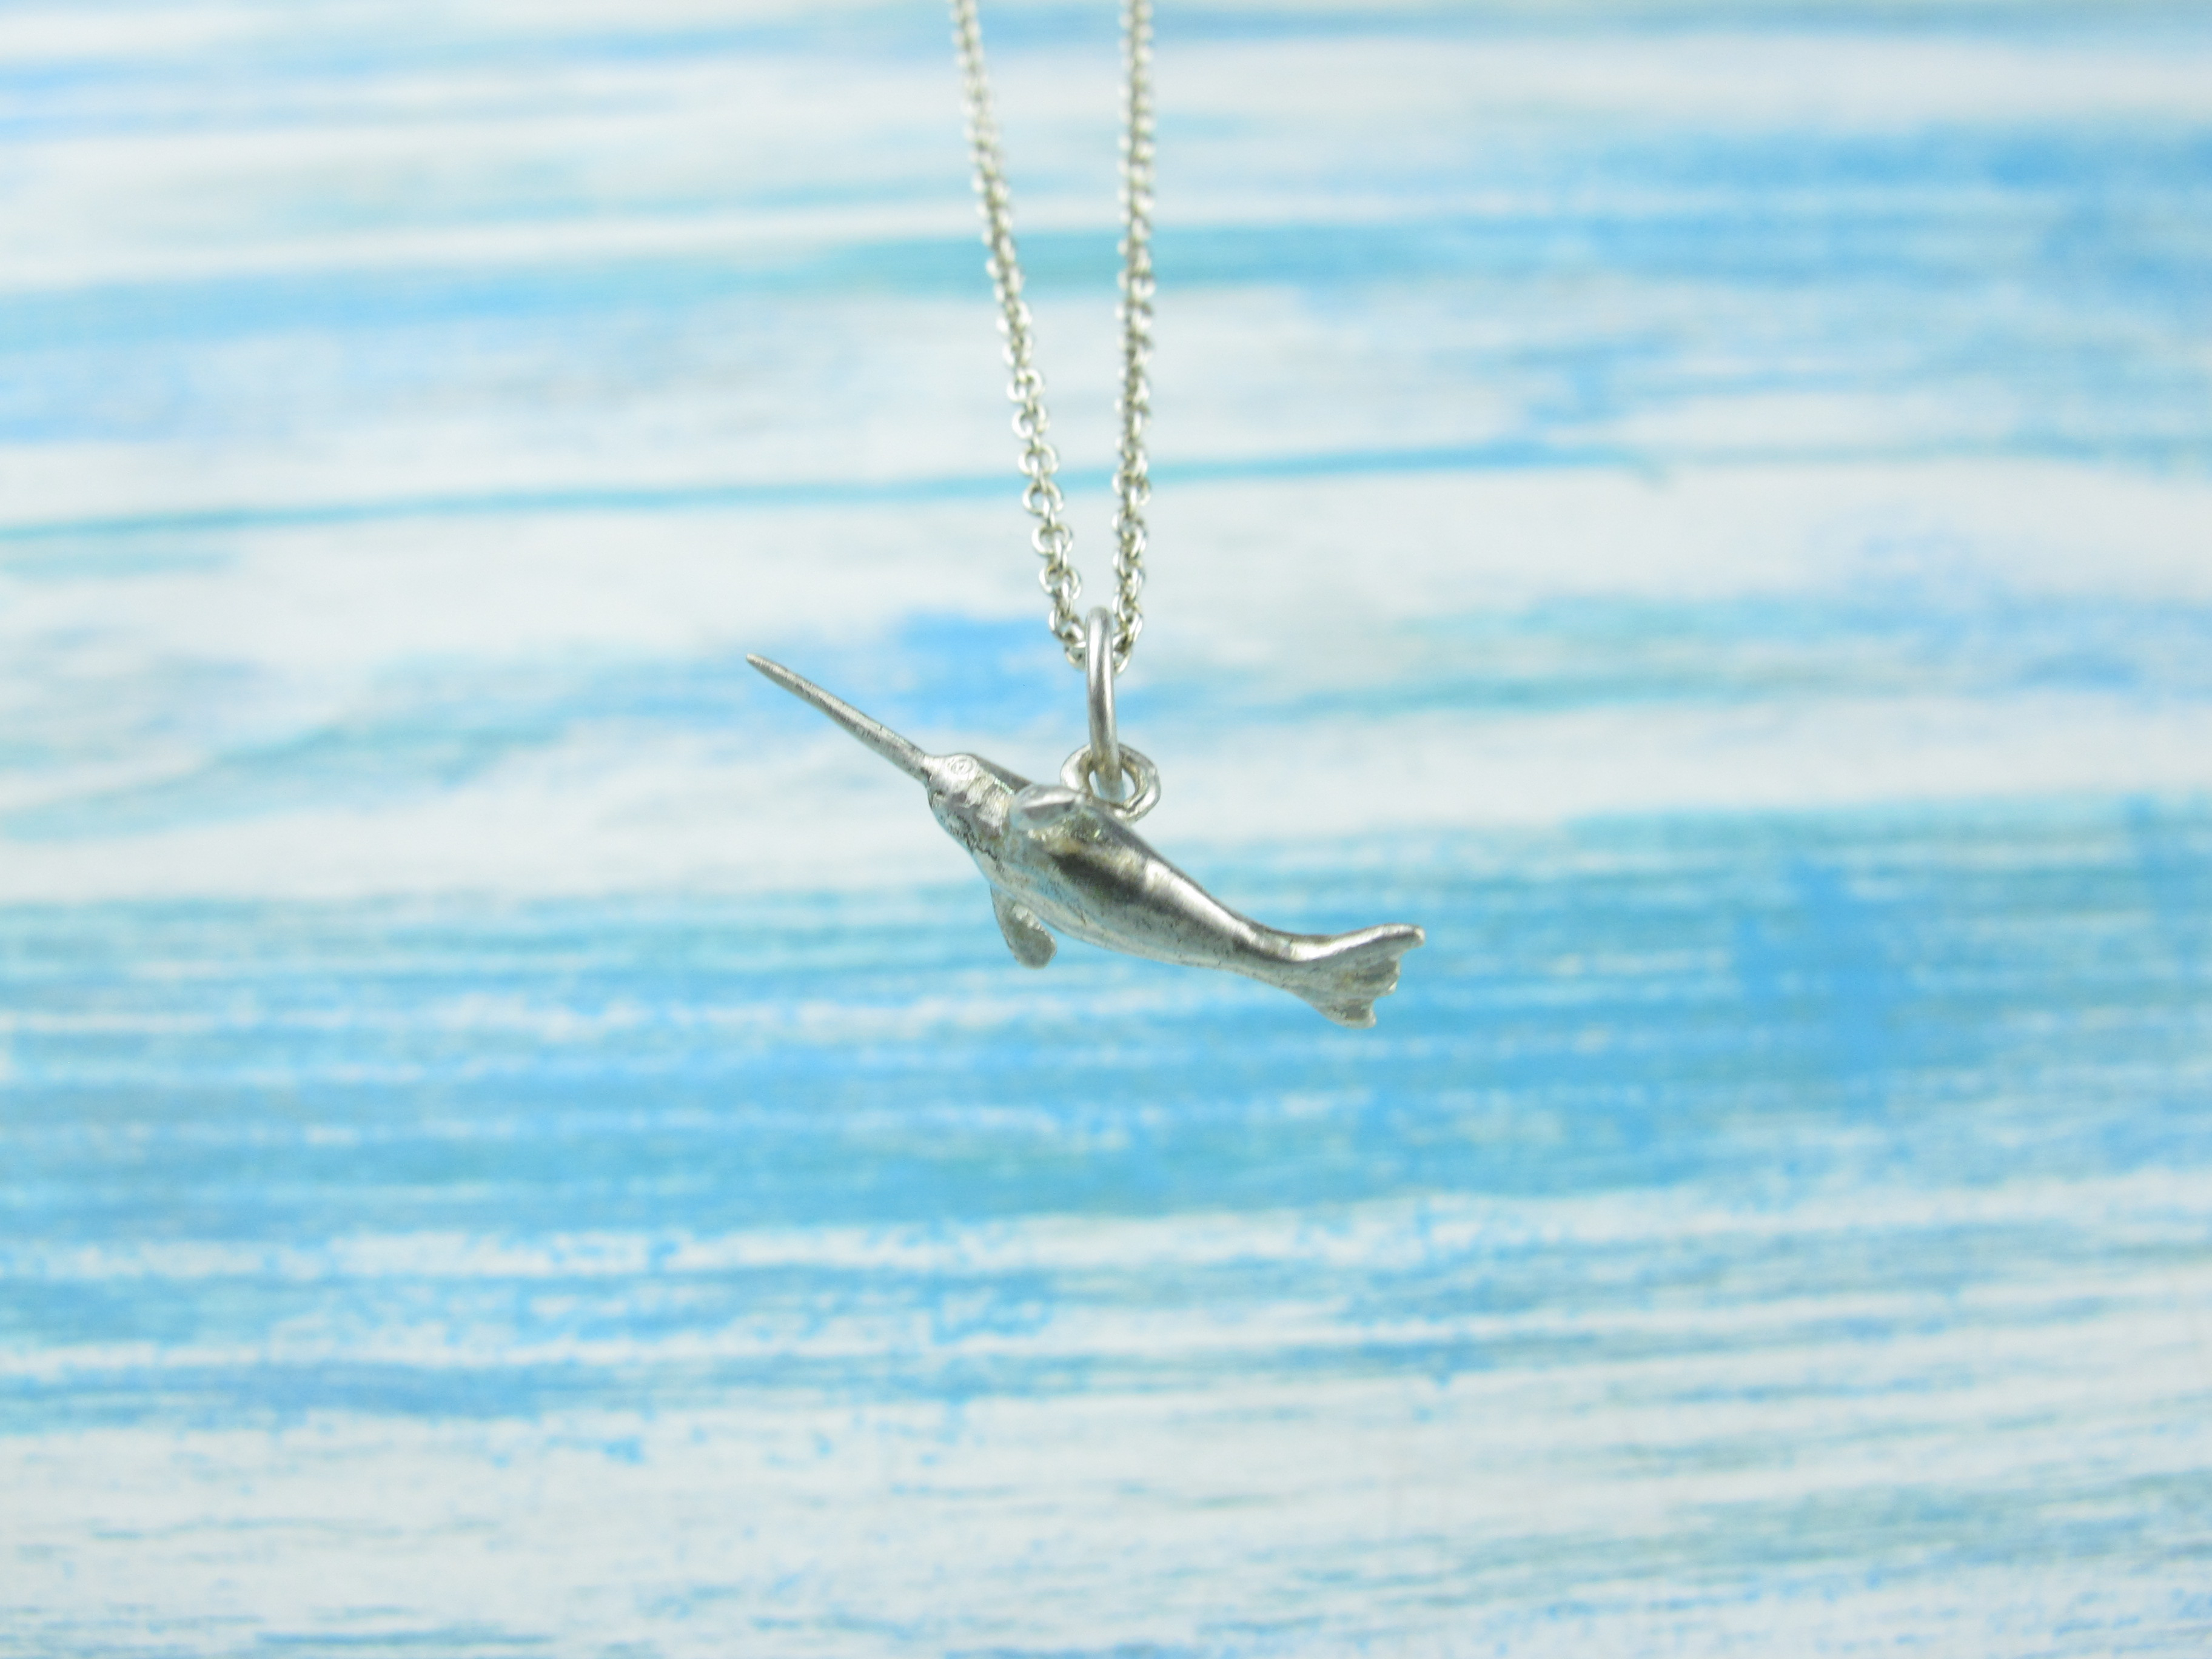 【Diving silver】925銀海洋潛水銀飾--迷你3D獨角鯨項鍊